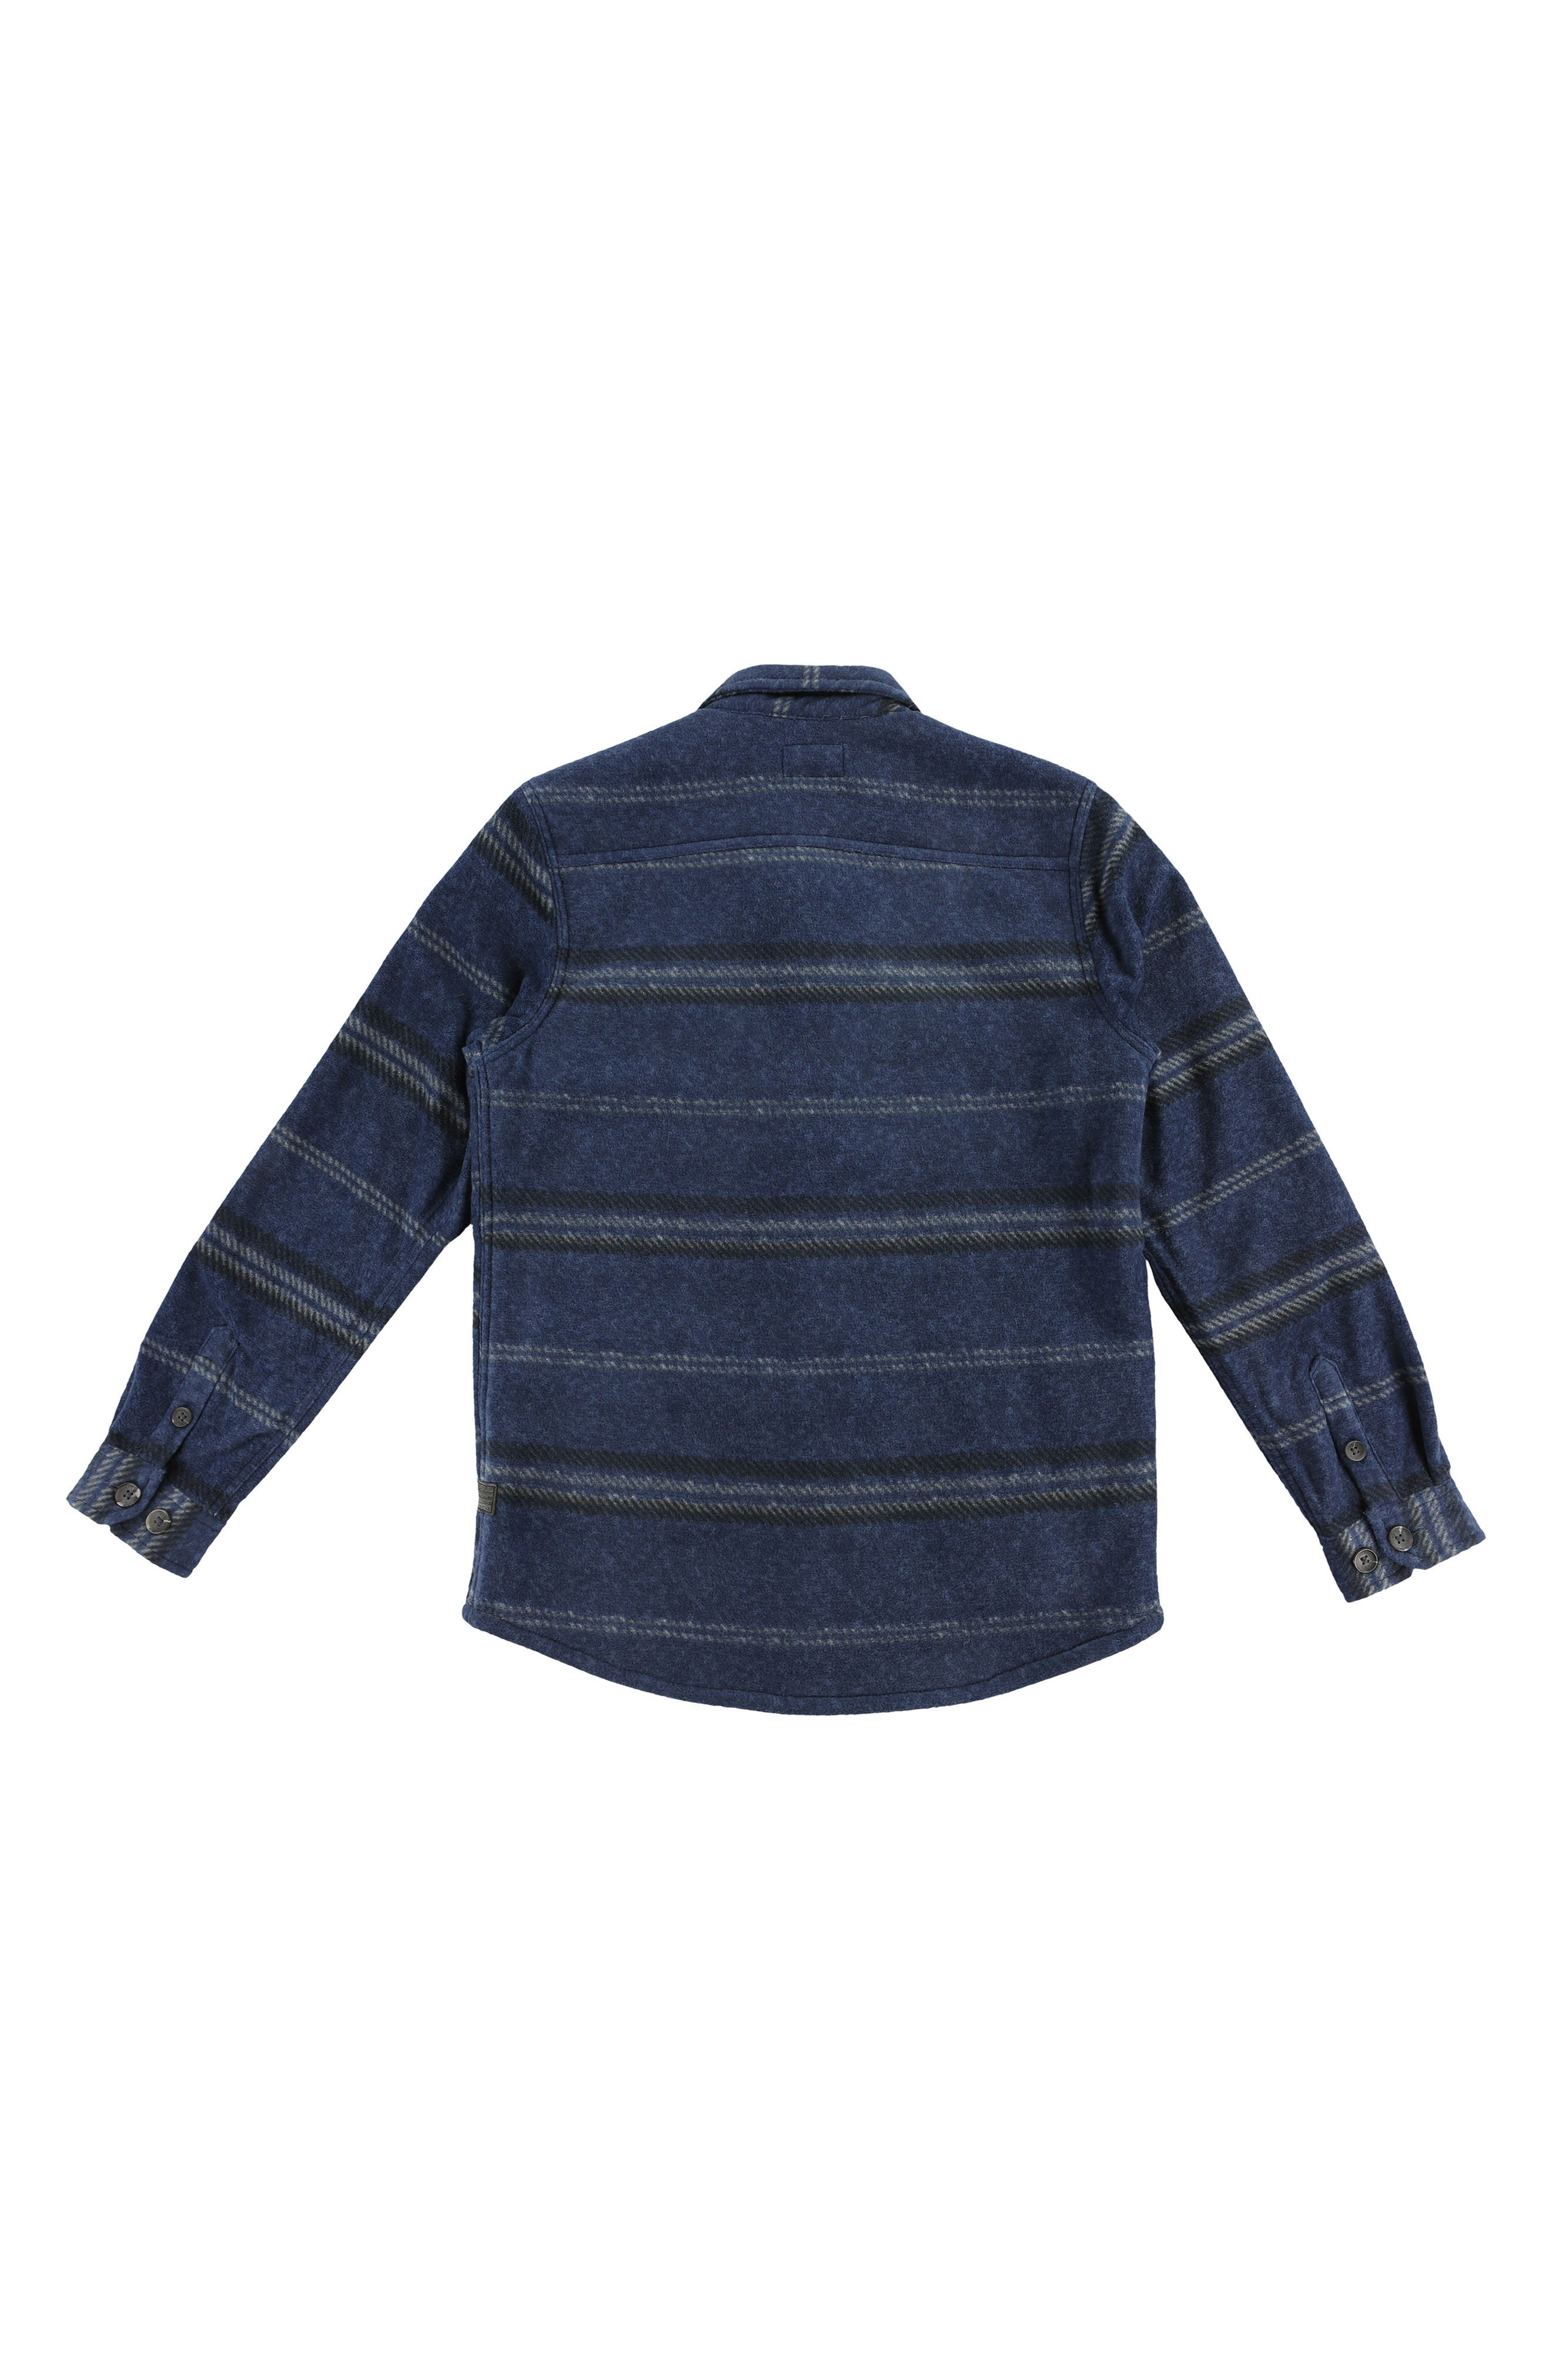 Glacier Shirt Jacket,                             Alternate thumbnail 2, color,                             NAVY HEATHER